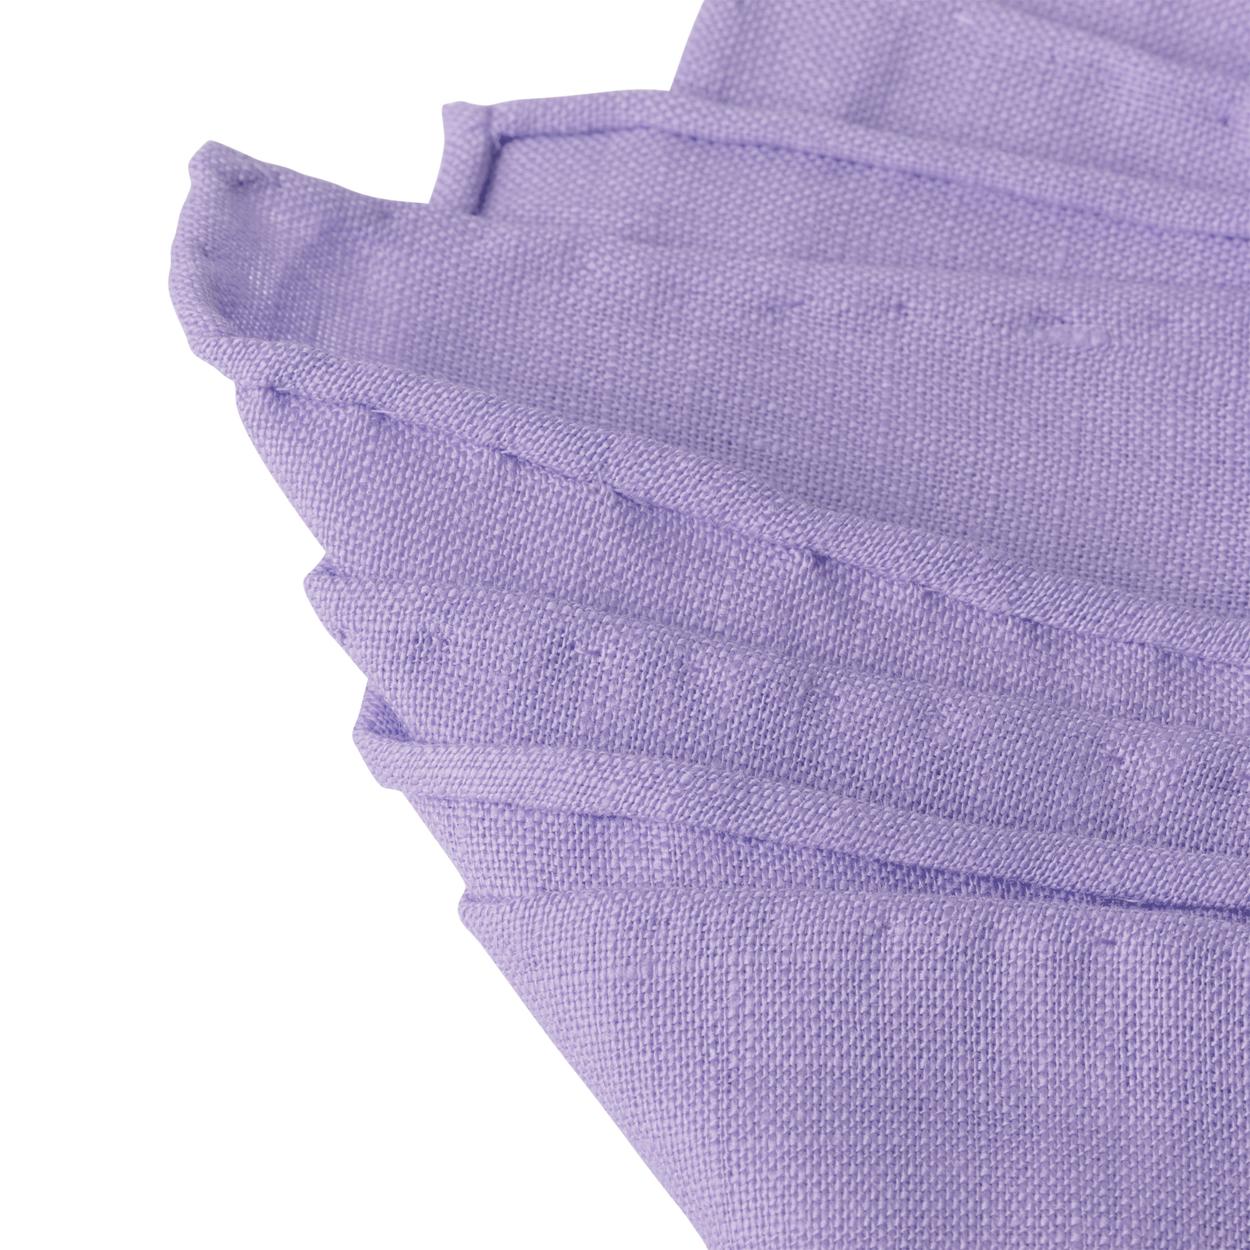 Jacob-Alexander-Linen-Handrolled-15-034-x-15-034-Pocket-Square-Hanky thumbnail 17